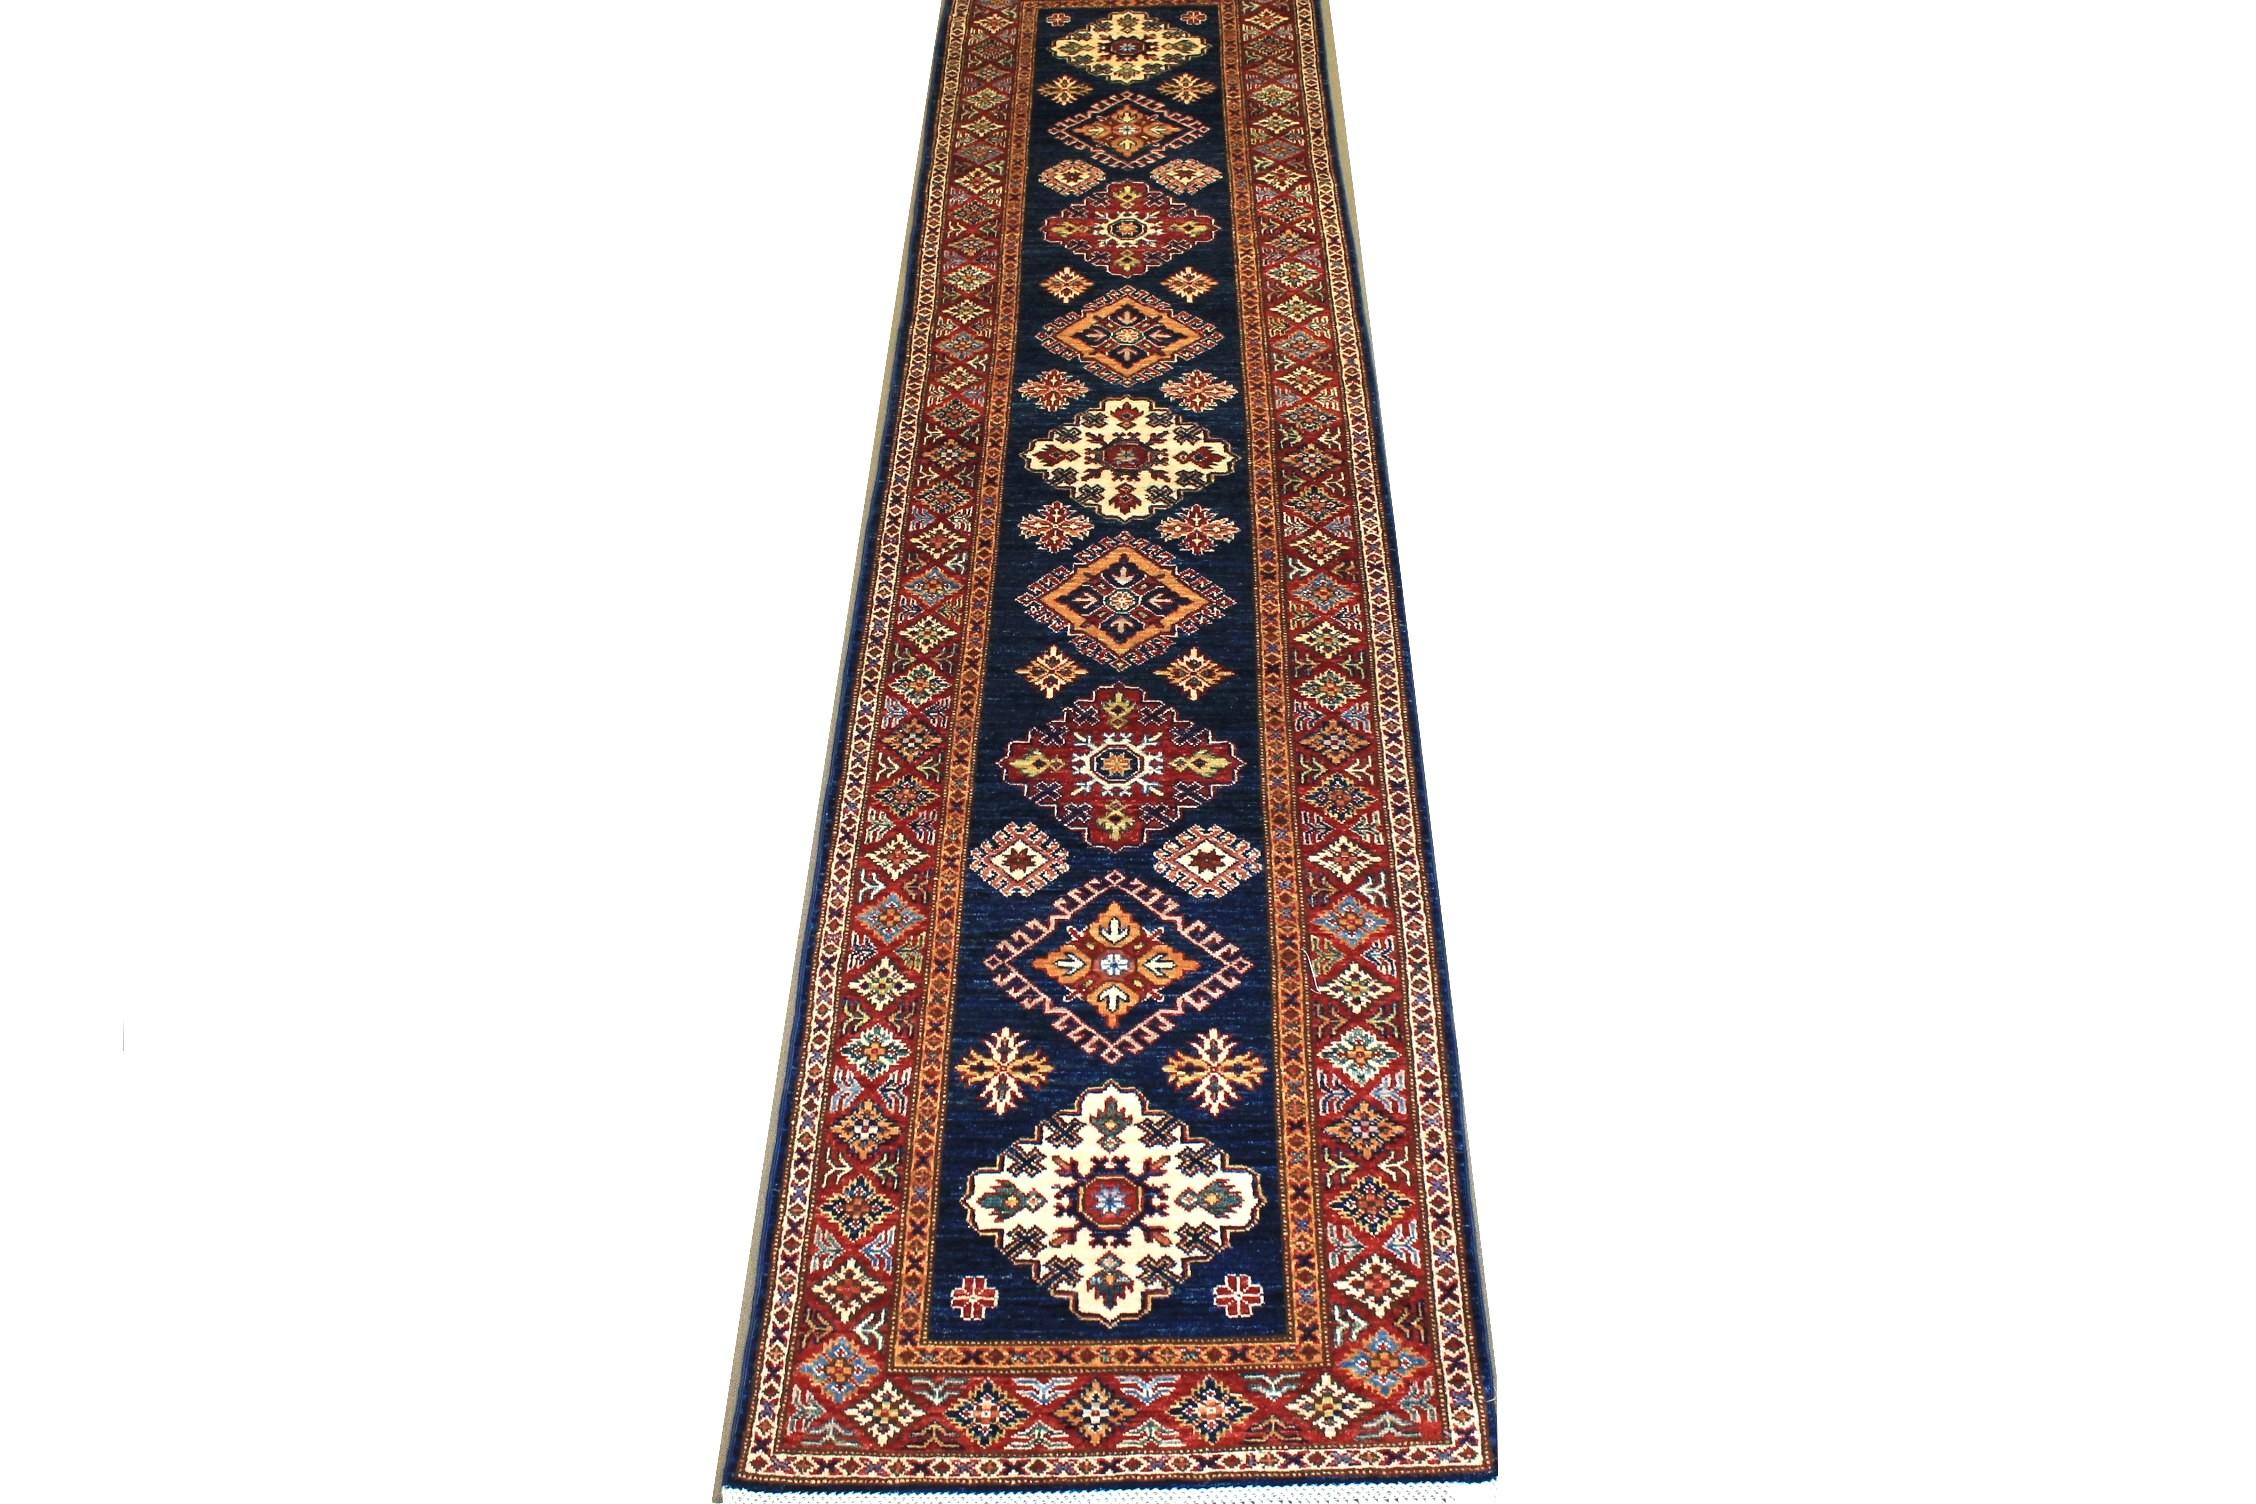 10 ft. Runner Kazak Hand Knotted Wool Area Rug - MR024692